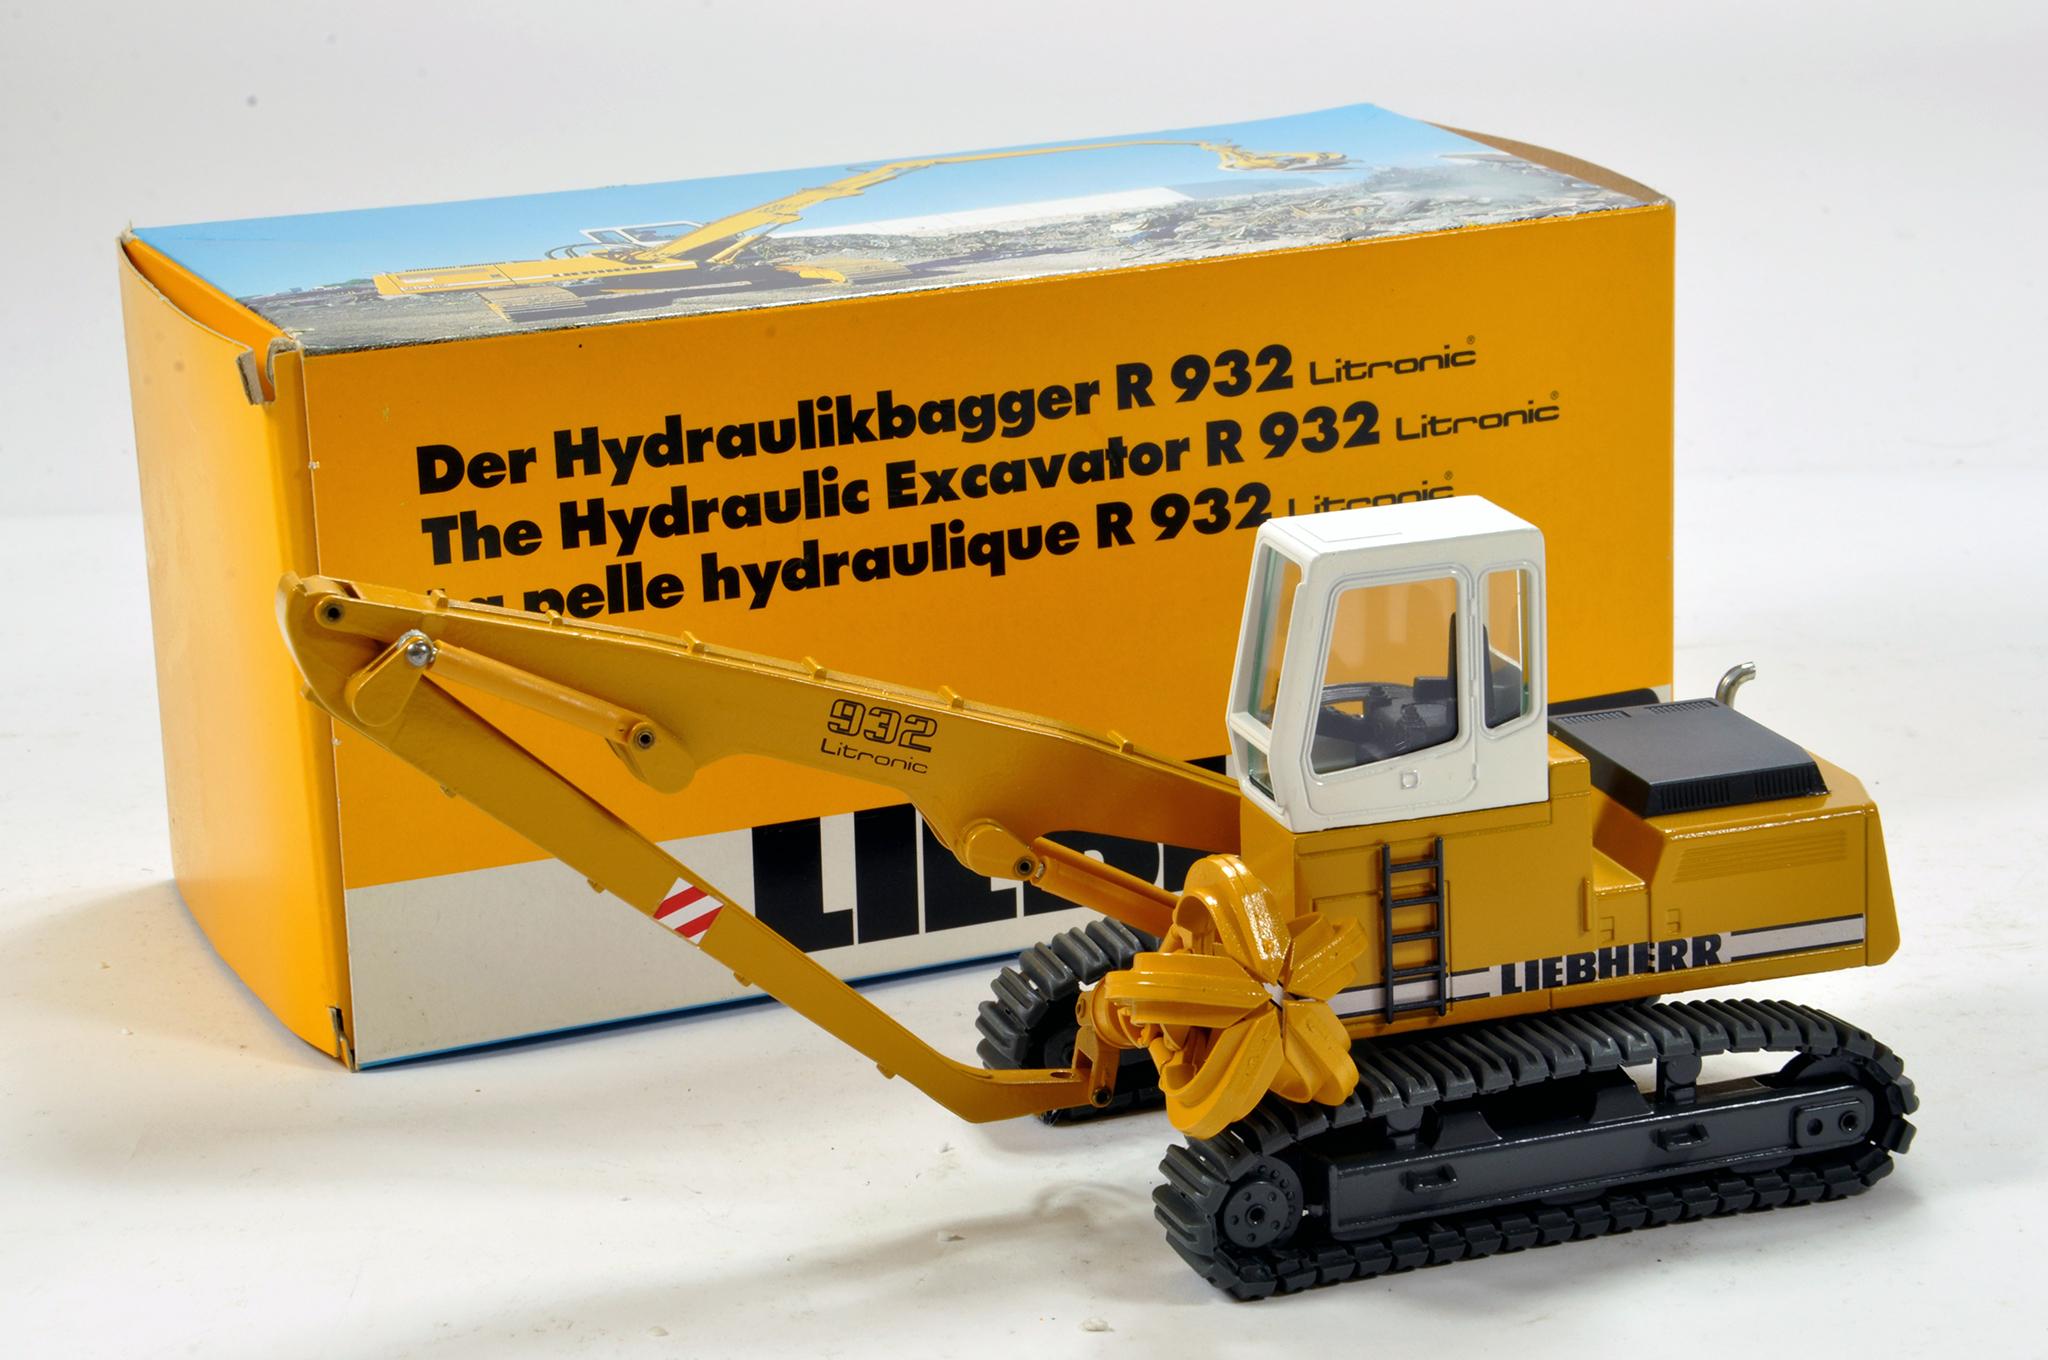 Lot 328 - Conrad 1/50 construction issue comprising Liebherr R932 Hydraulic Excavator. E to NM.